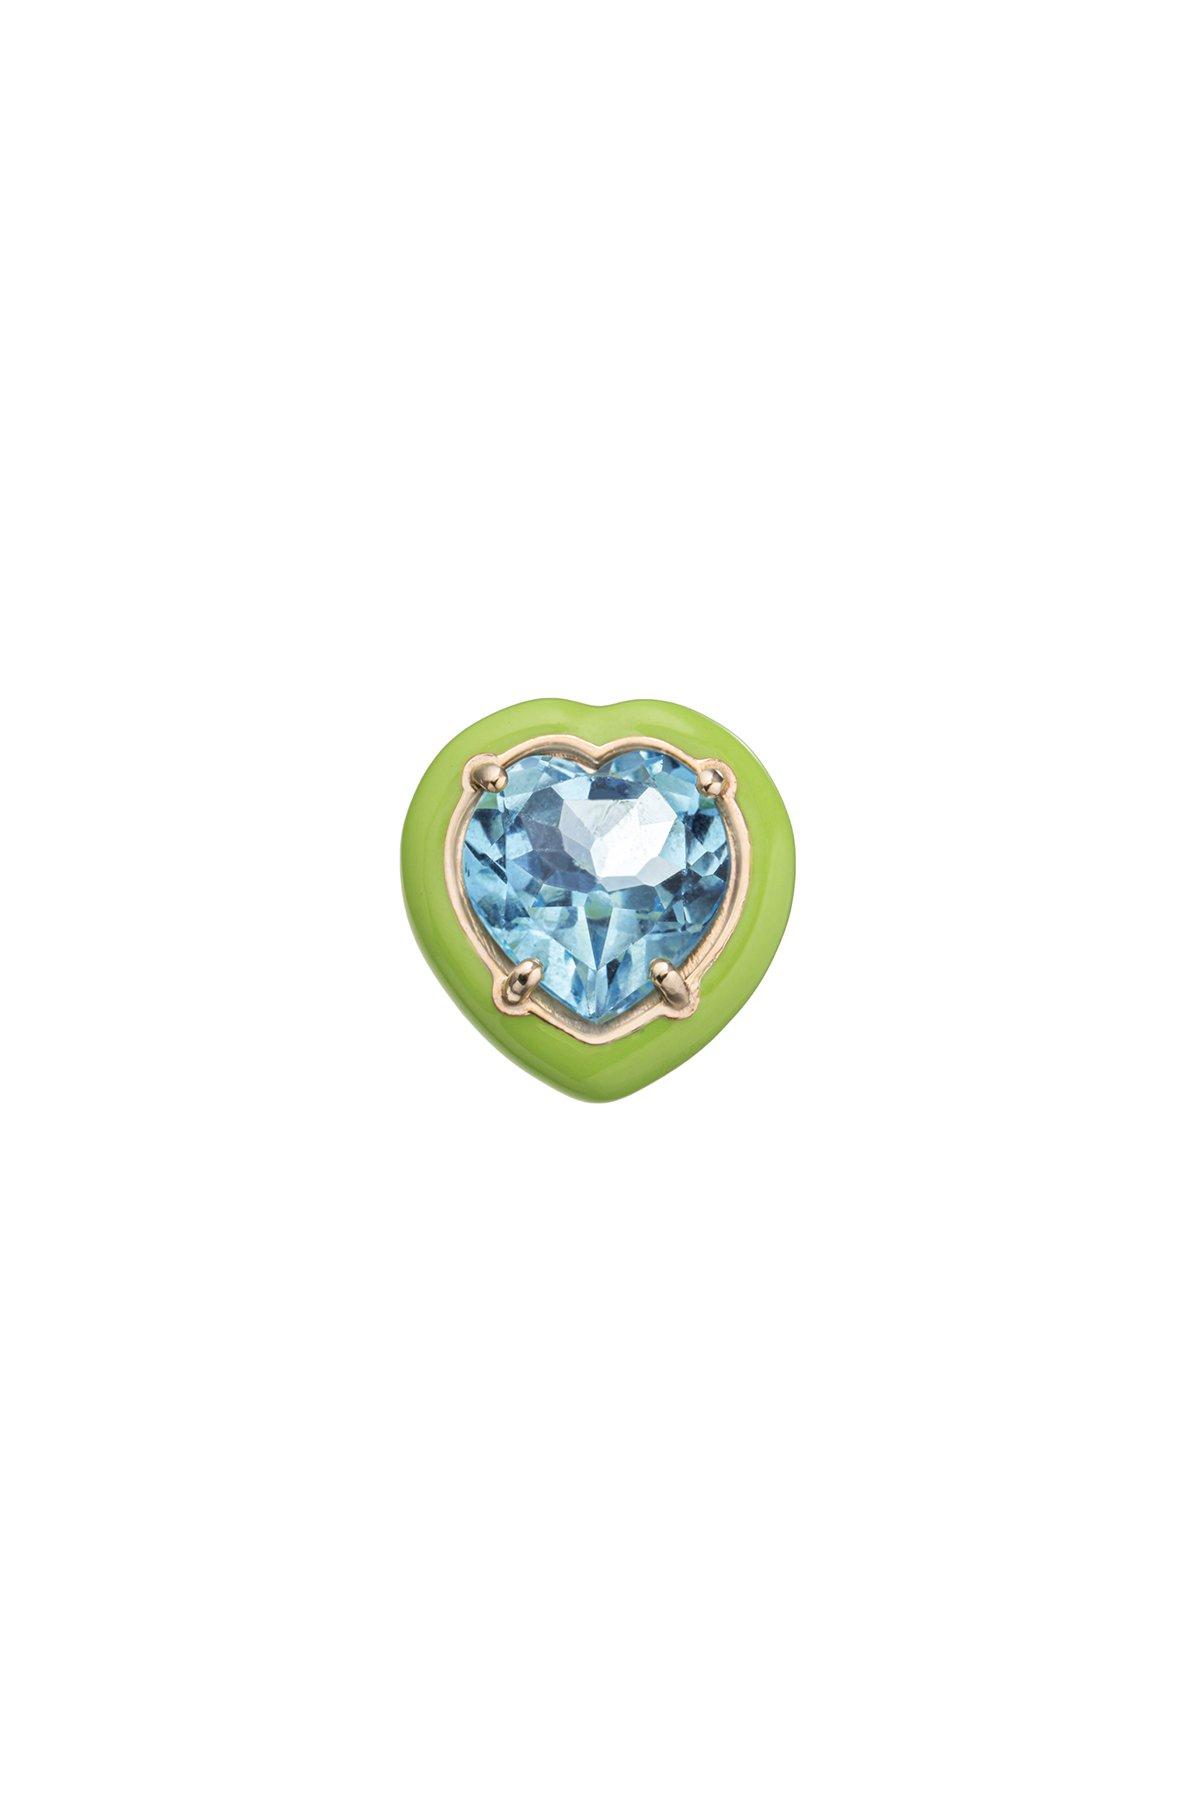 Bea bongiasca orecchino candy heart